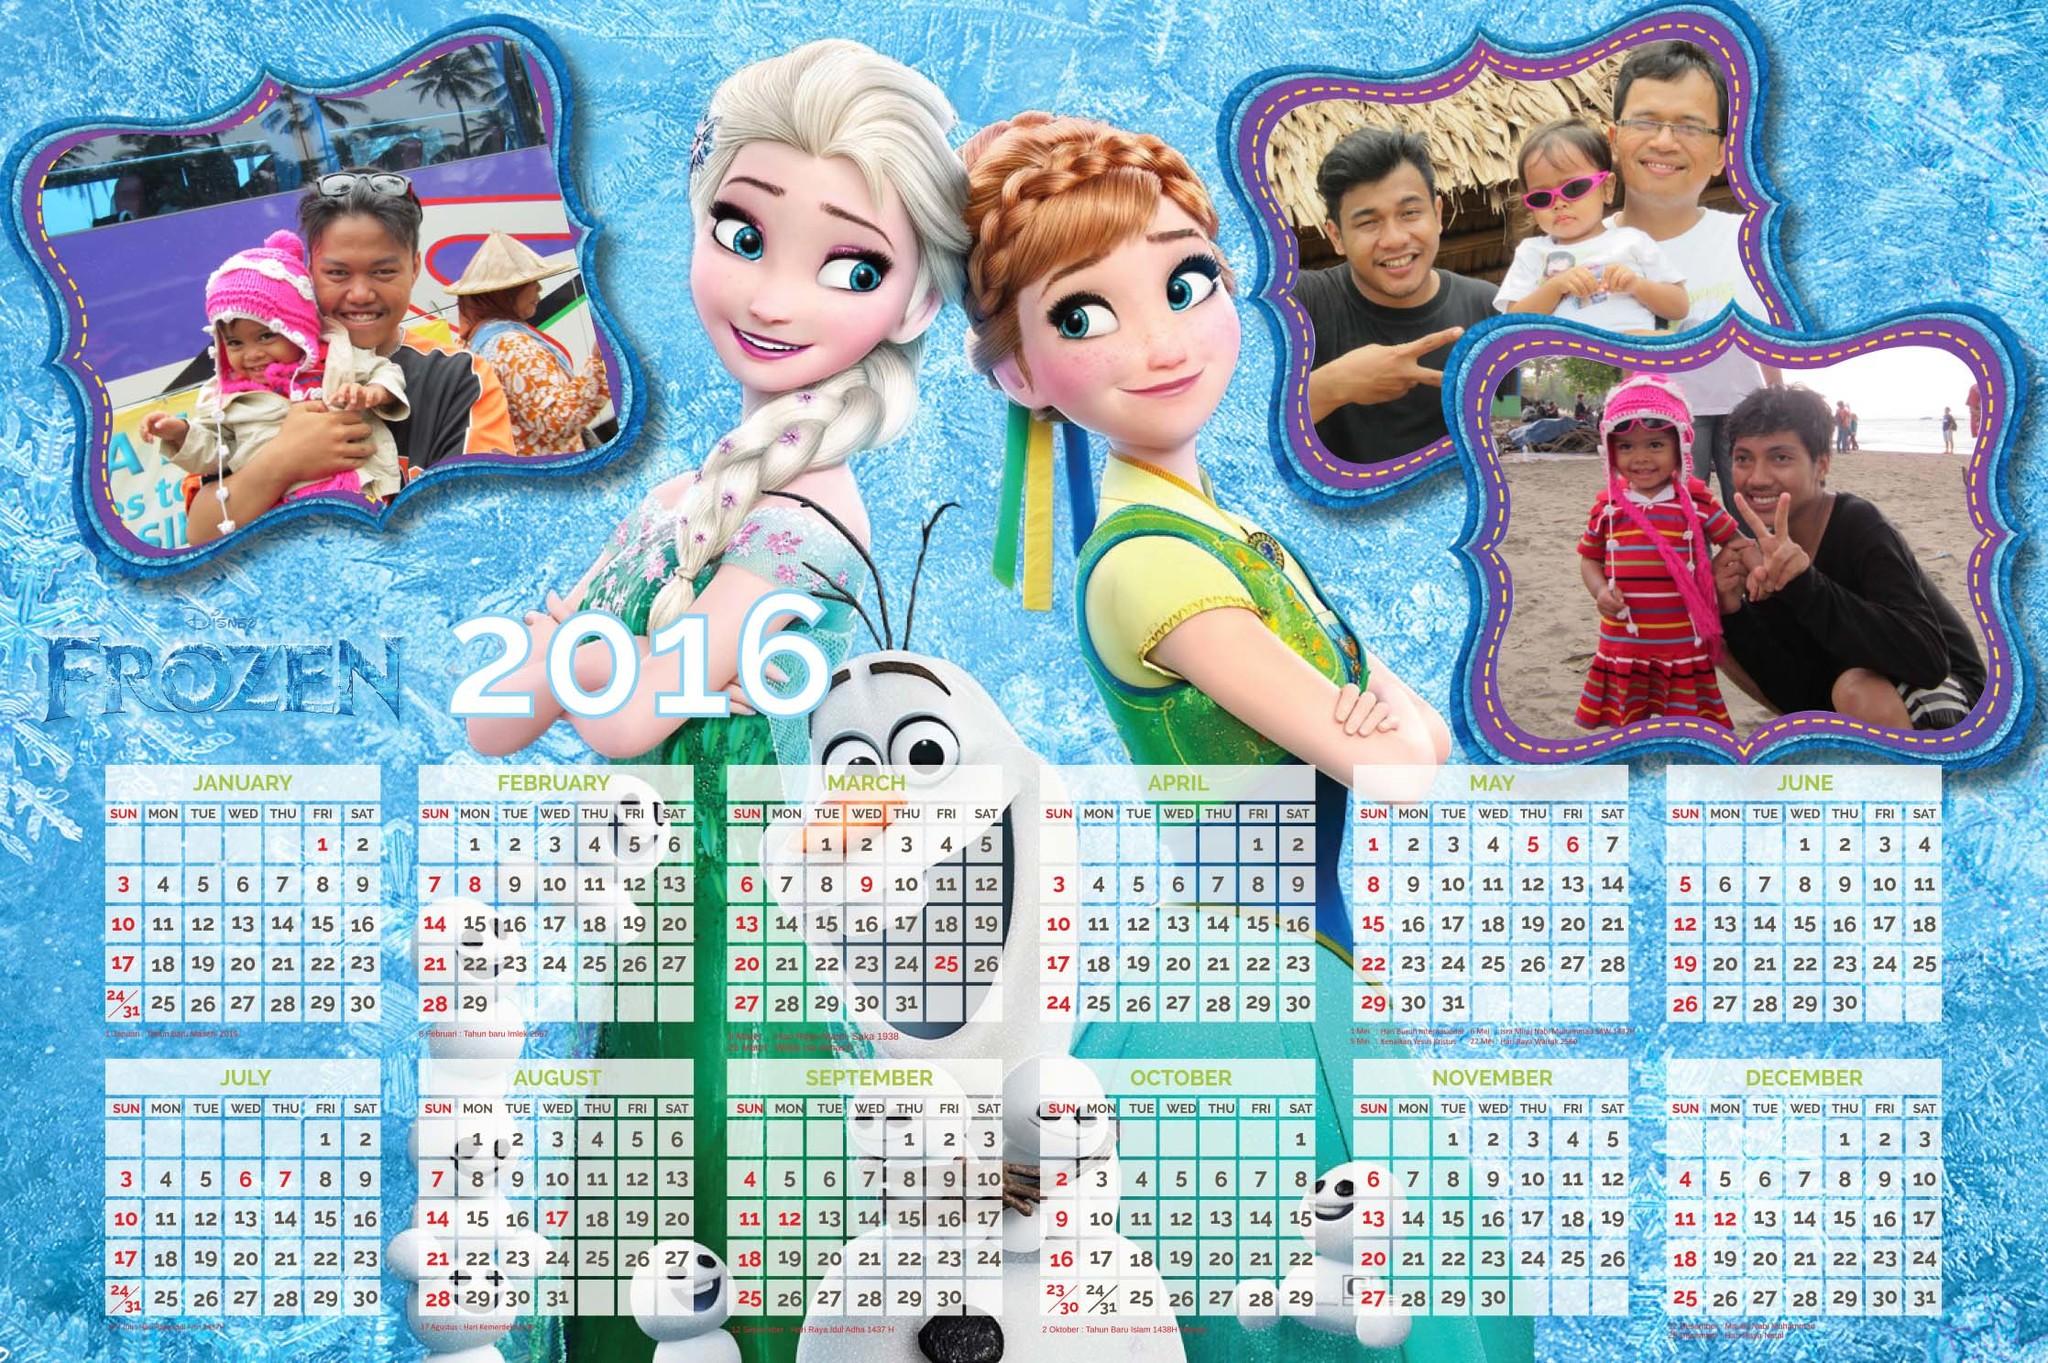 Jual Kalender Foto 2016 Tema Frozen - Aqilahku | Tokopedia